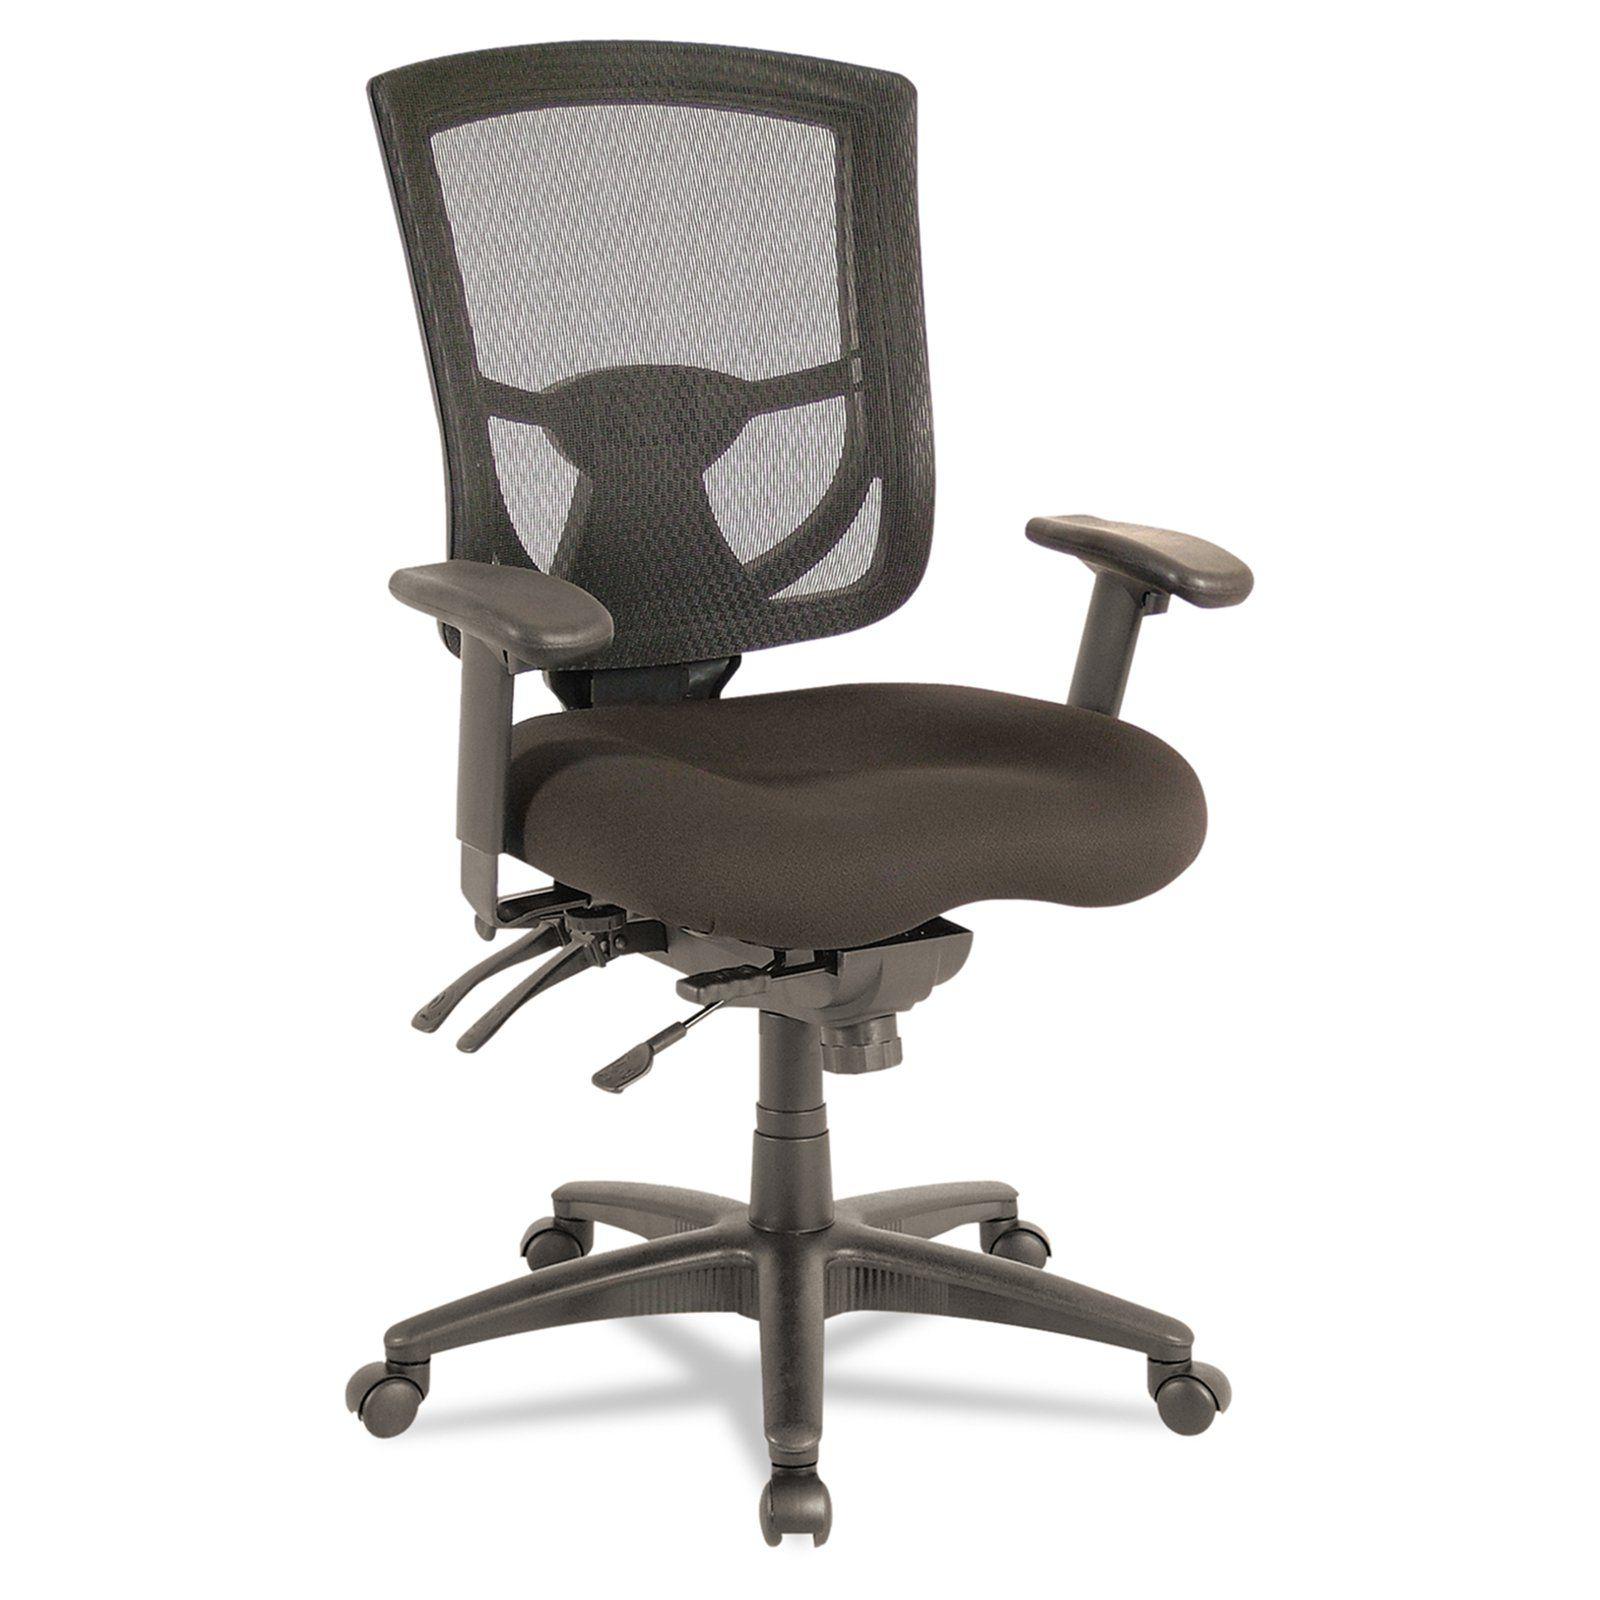 Alera ex series mesh multifunction midback chair black